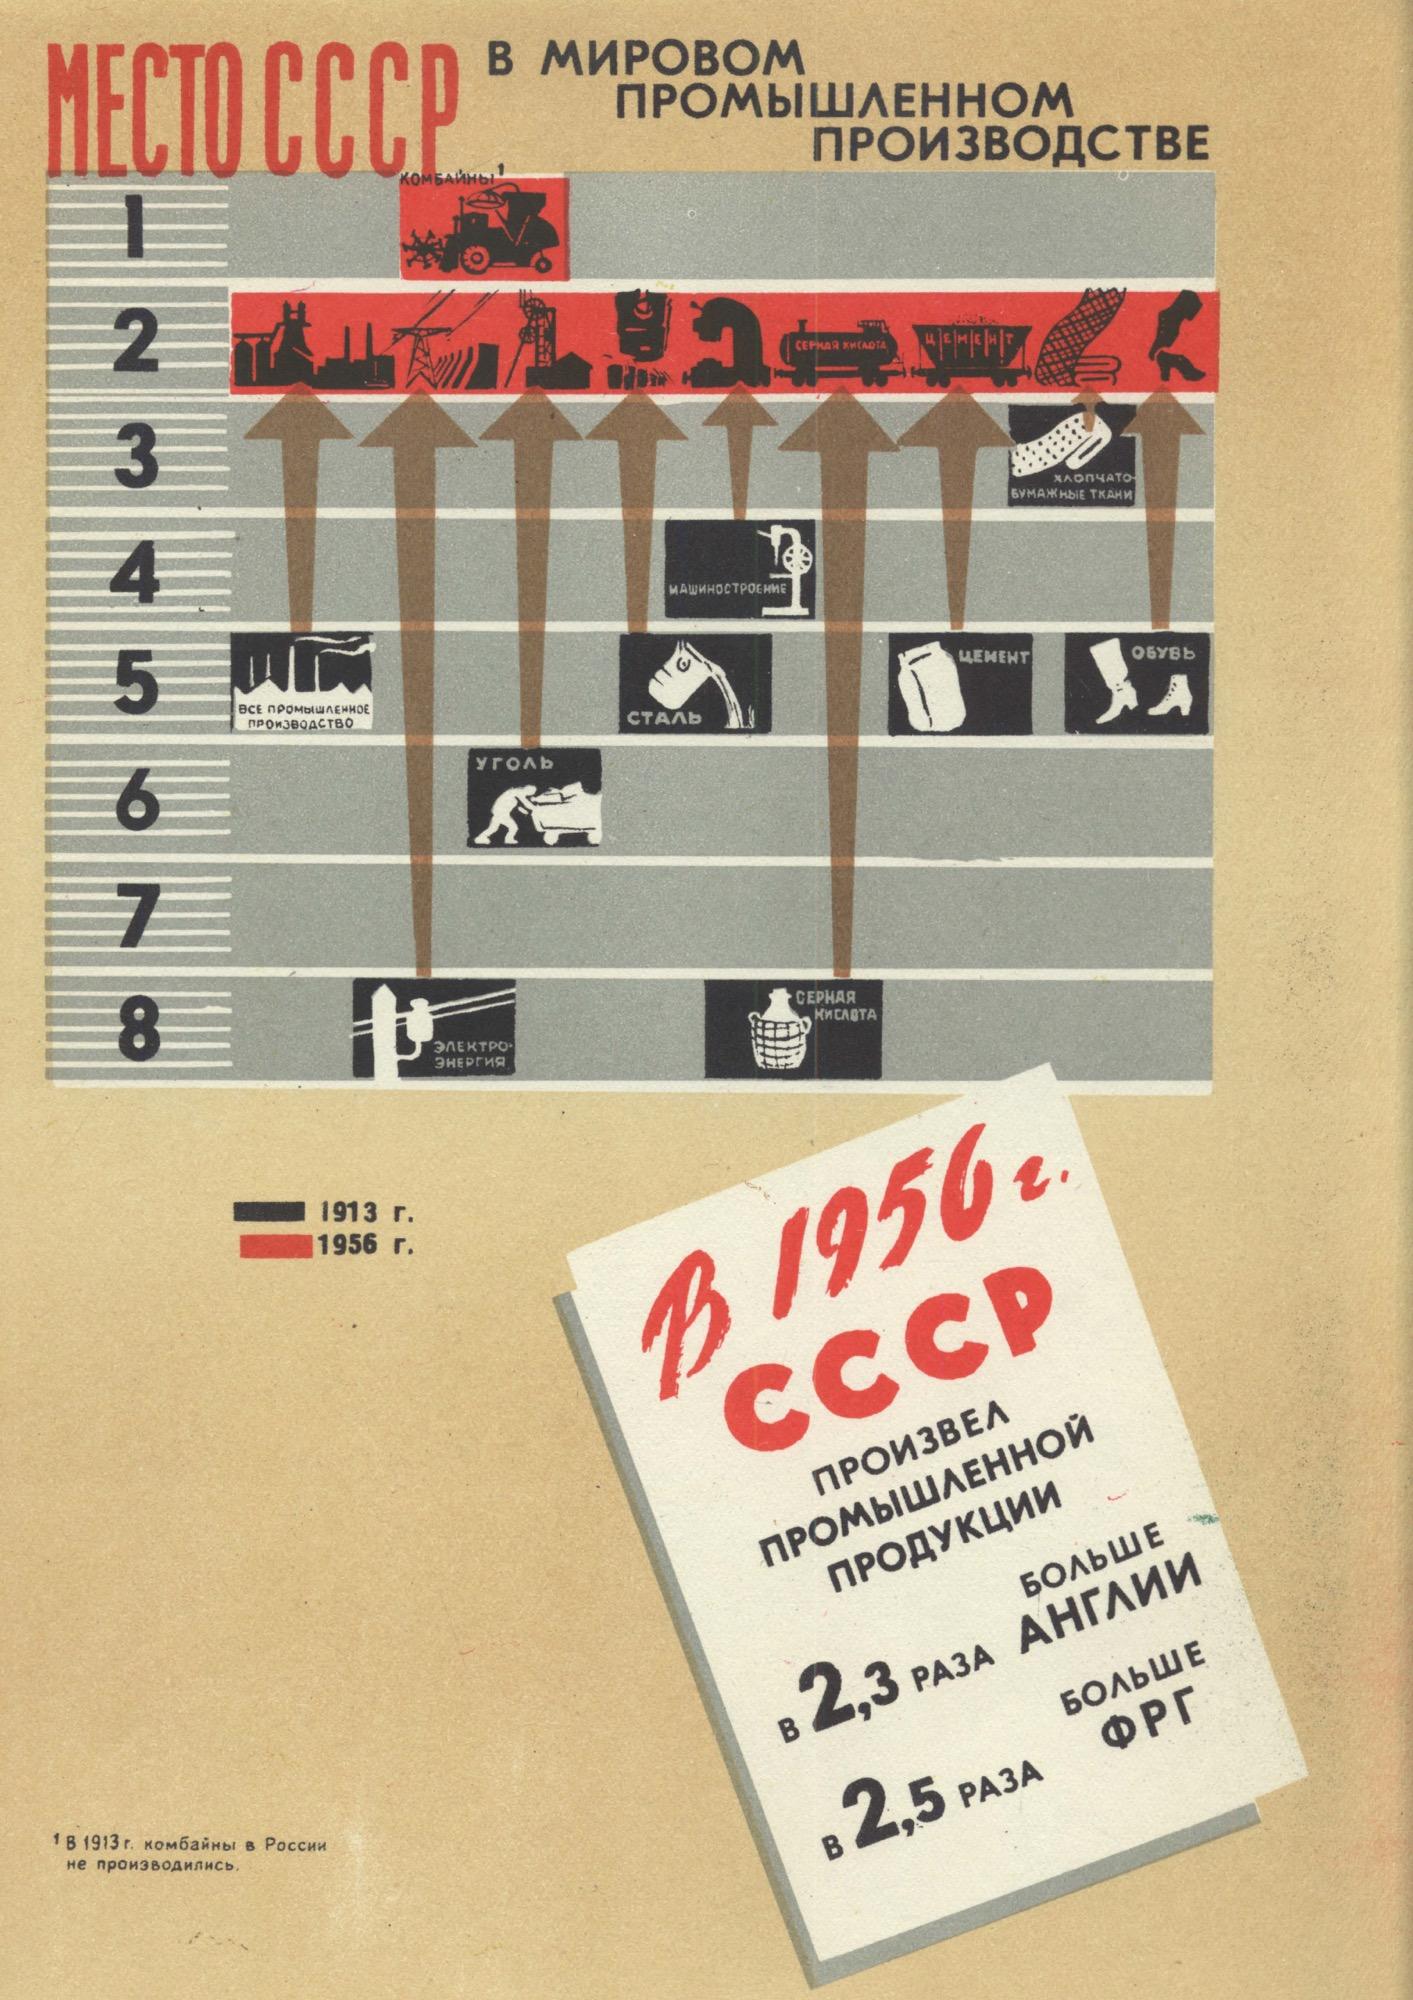 cccp infographics 4